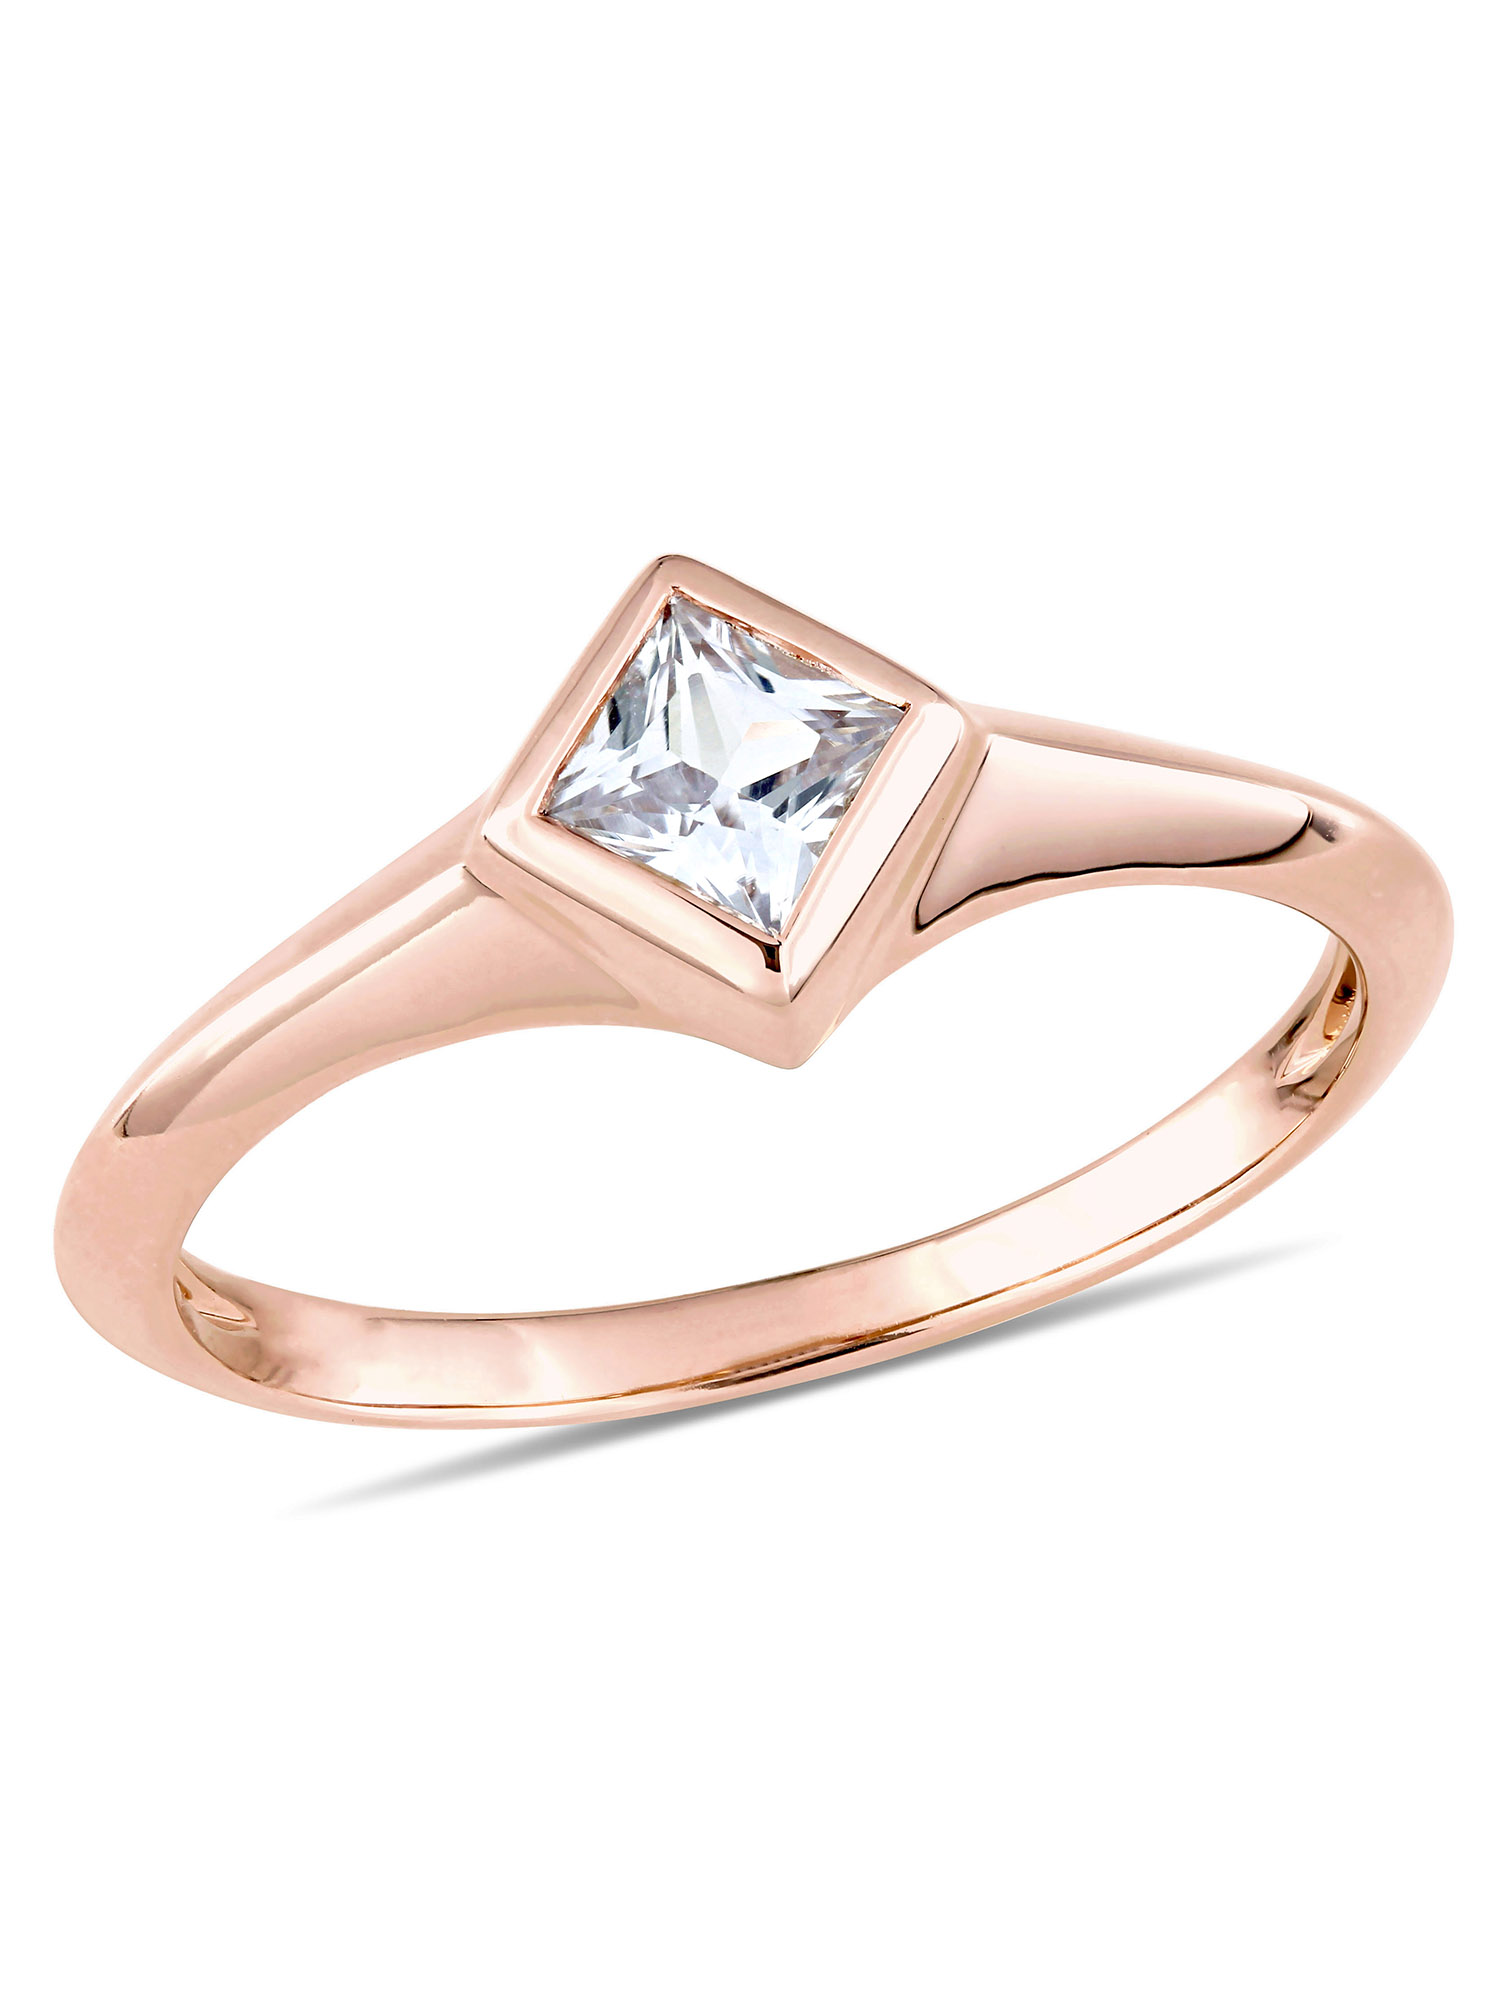 Miabella 3/8 Carat T.G.W. White Sapphire 14k Rose Gold Square Promise Ring